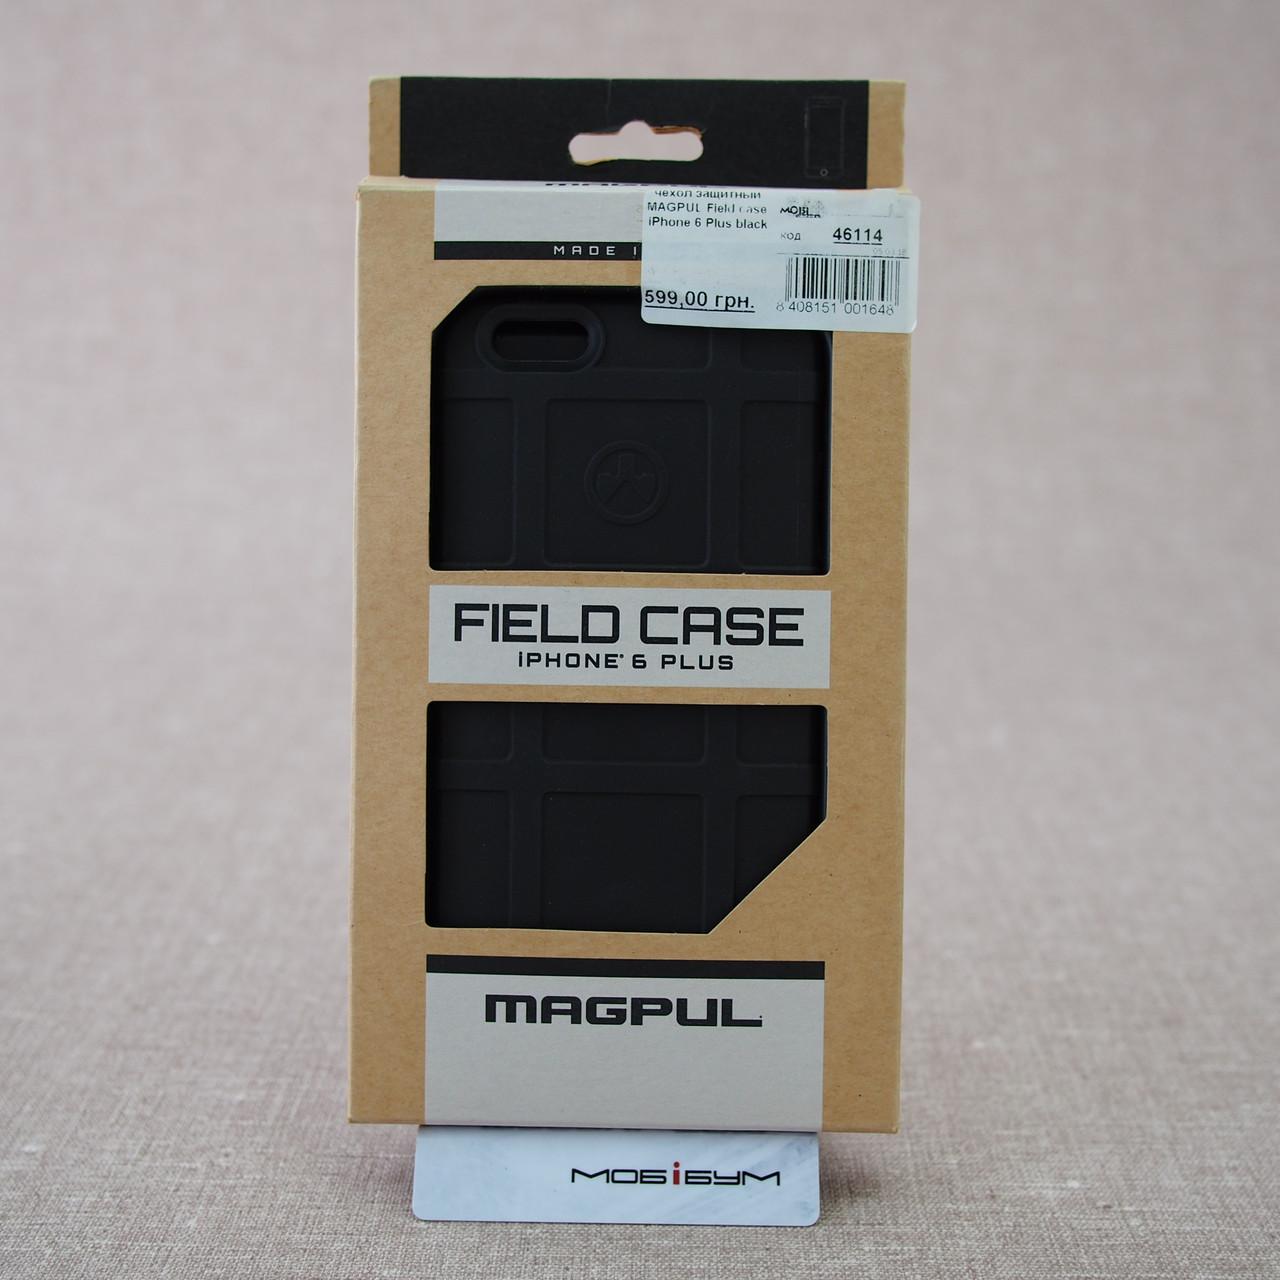 Чехол защитный MAGPUL Field case iPhone 6 Plus black (MAG485-BLK) EAN/UPC: 840815100164